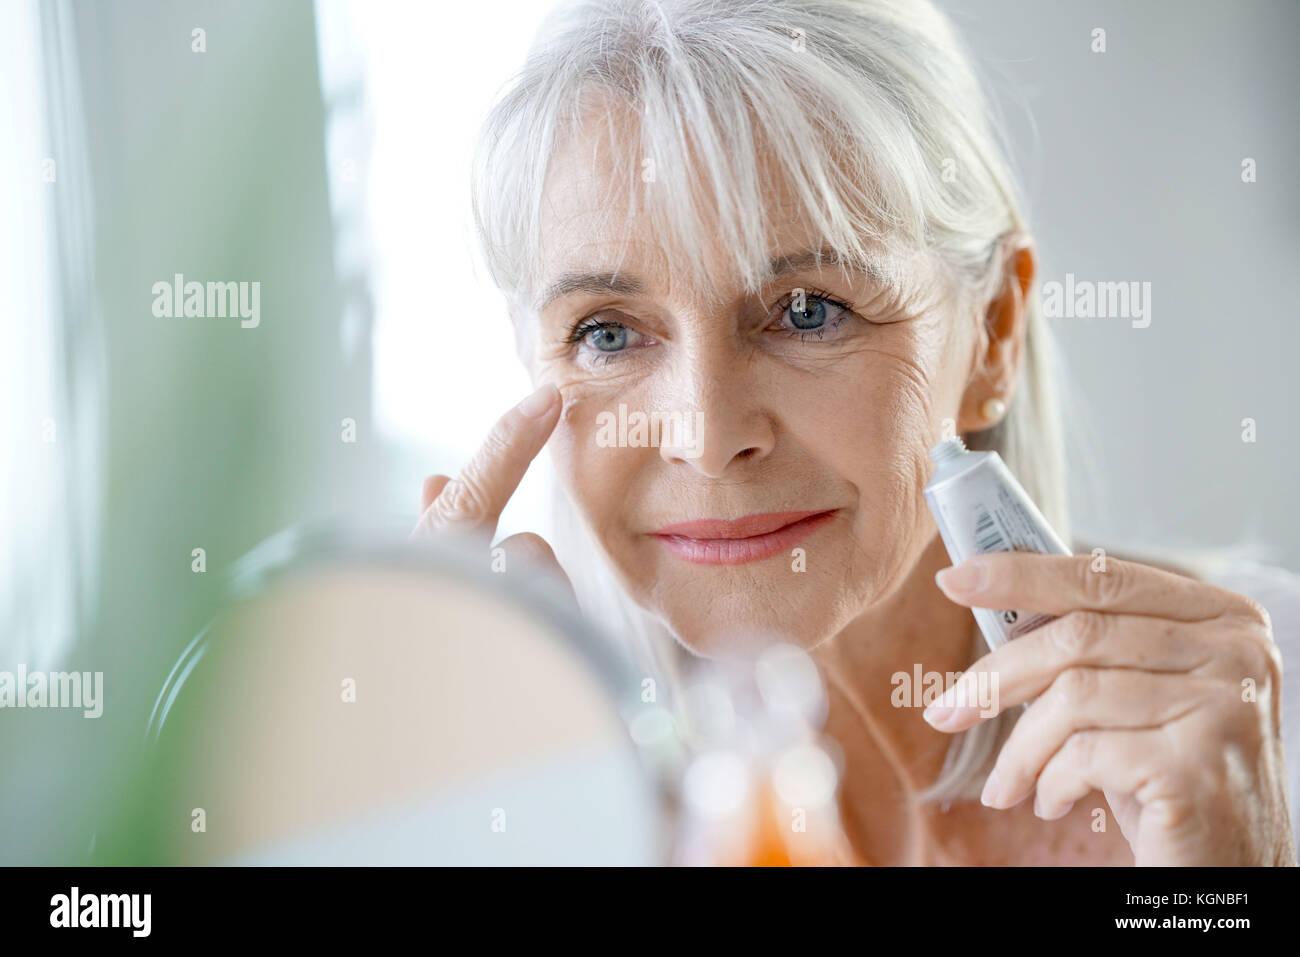 Portrait of senior woman applying anti-aging cream - Stock Image